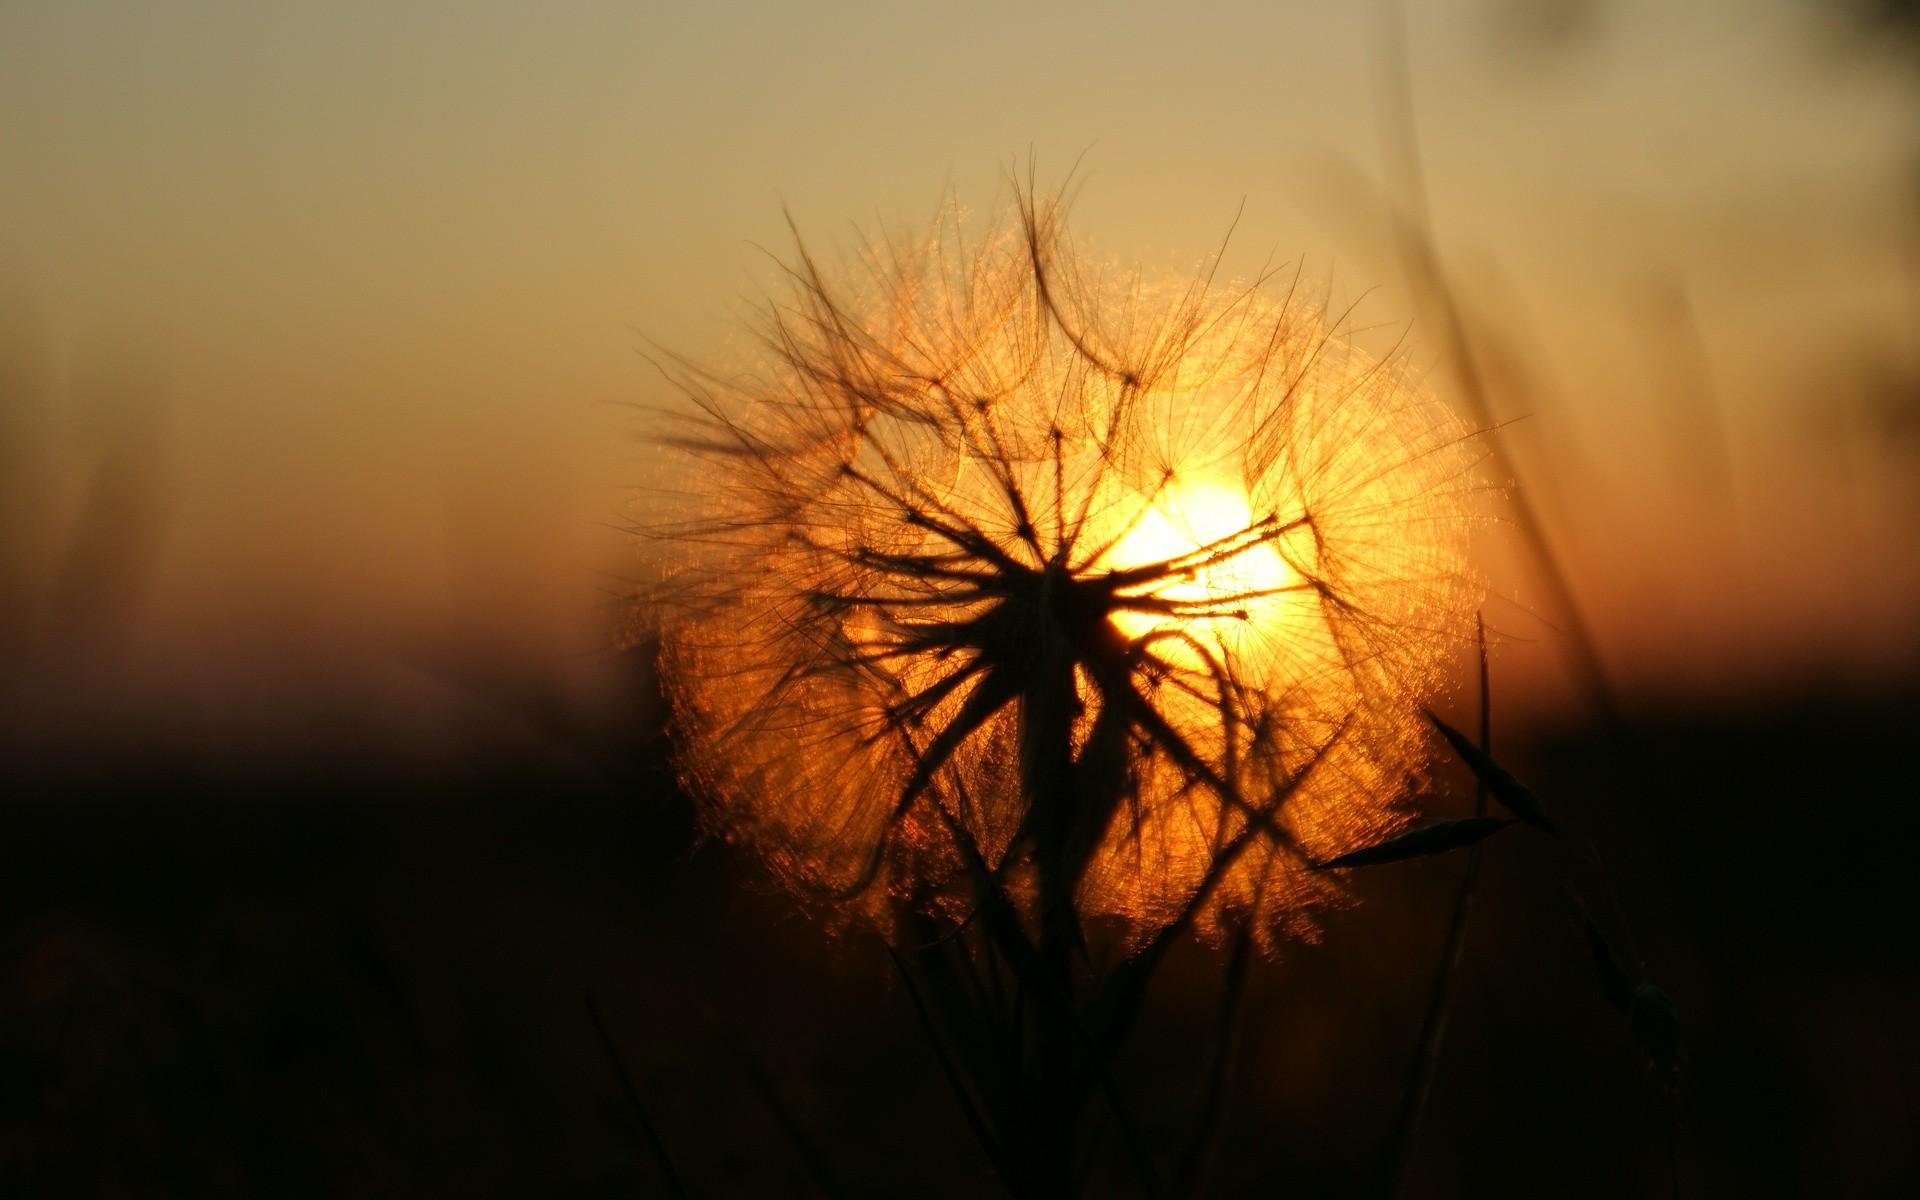 nature sunset grass dandelion - photo #2